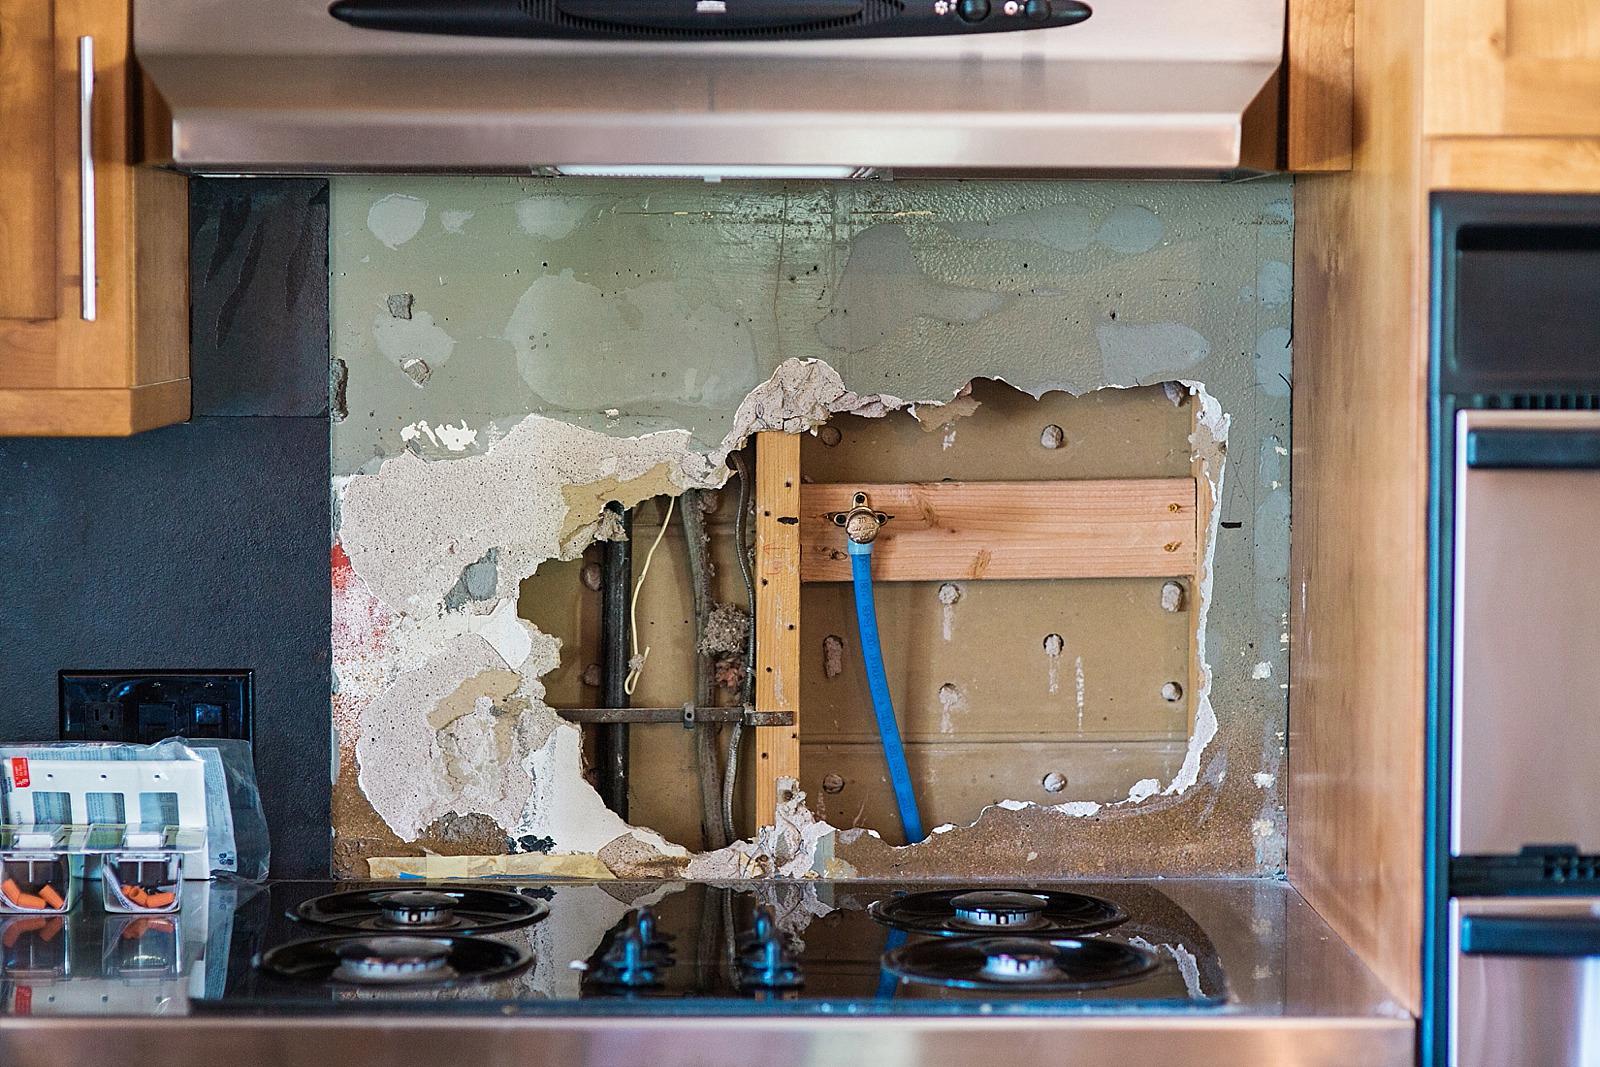 install-pot-filler-how-to-position-kitchen-DEP_0991